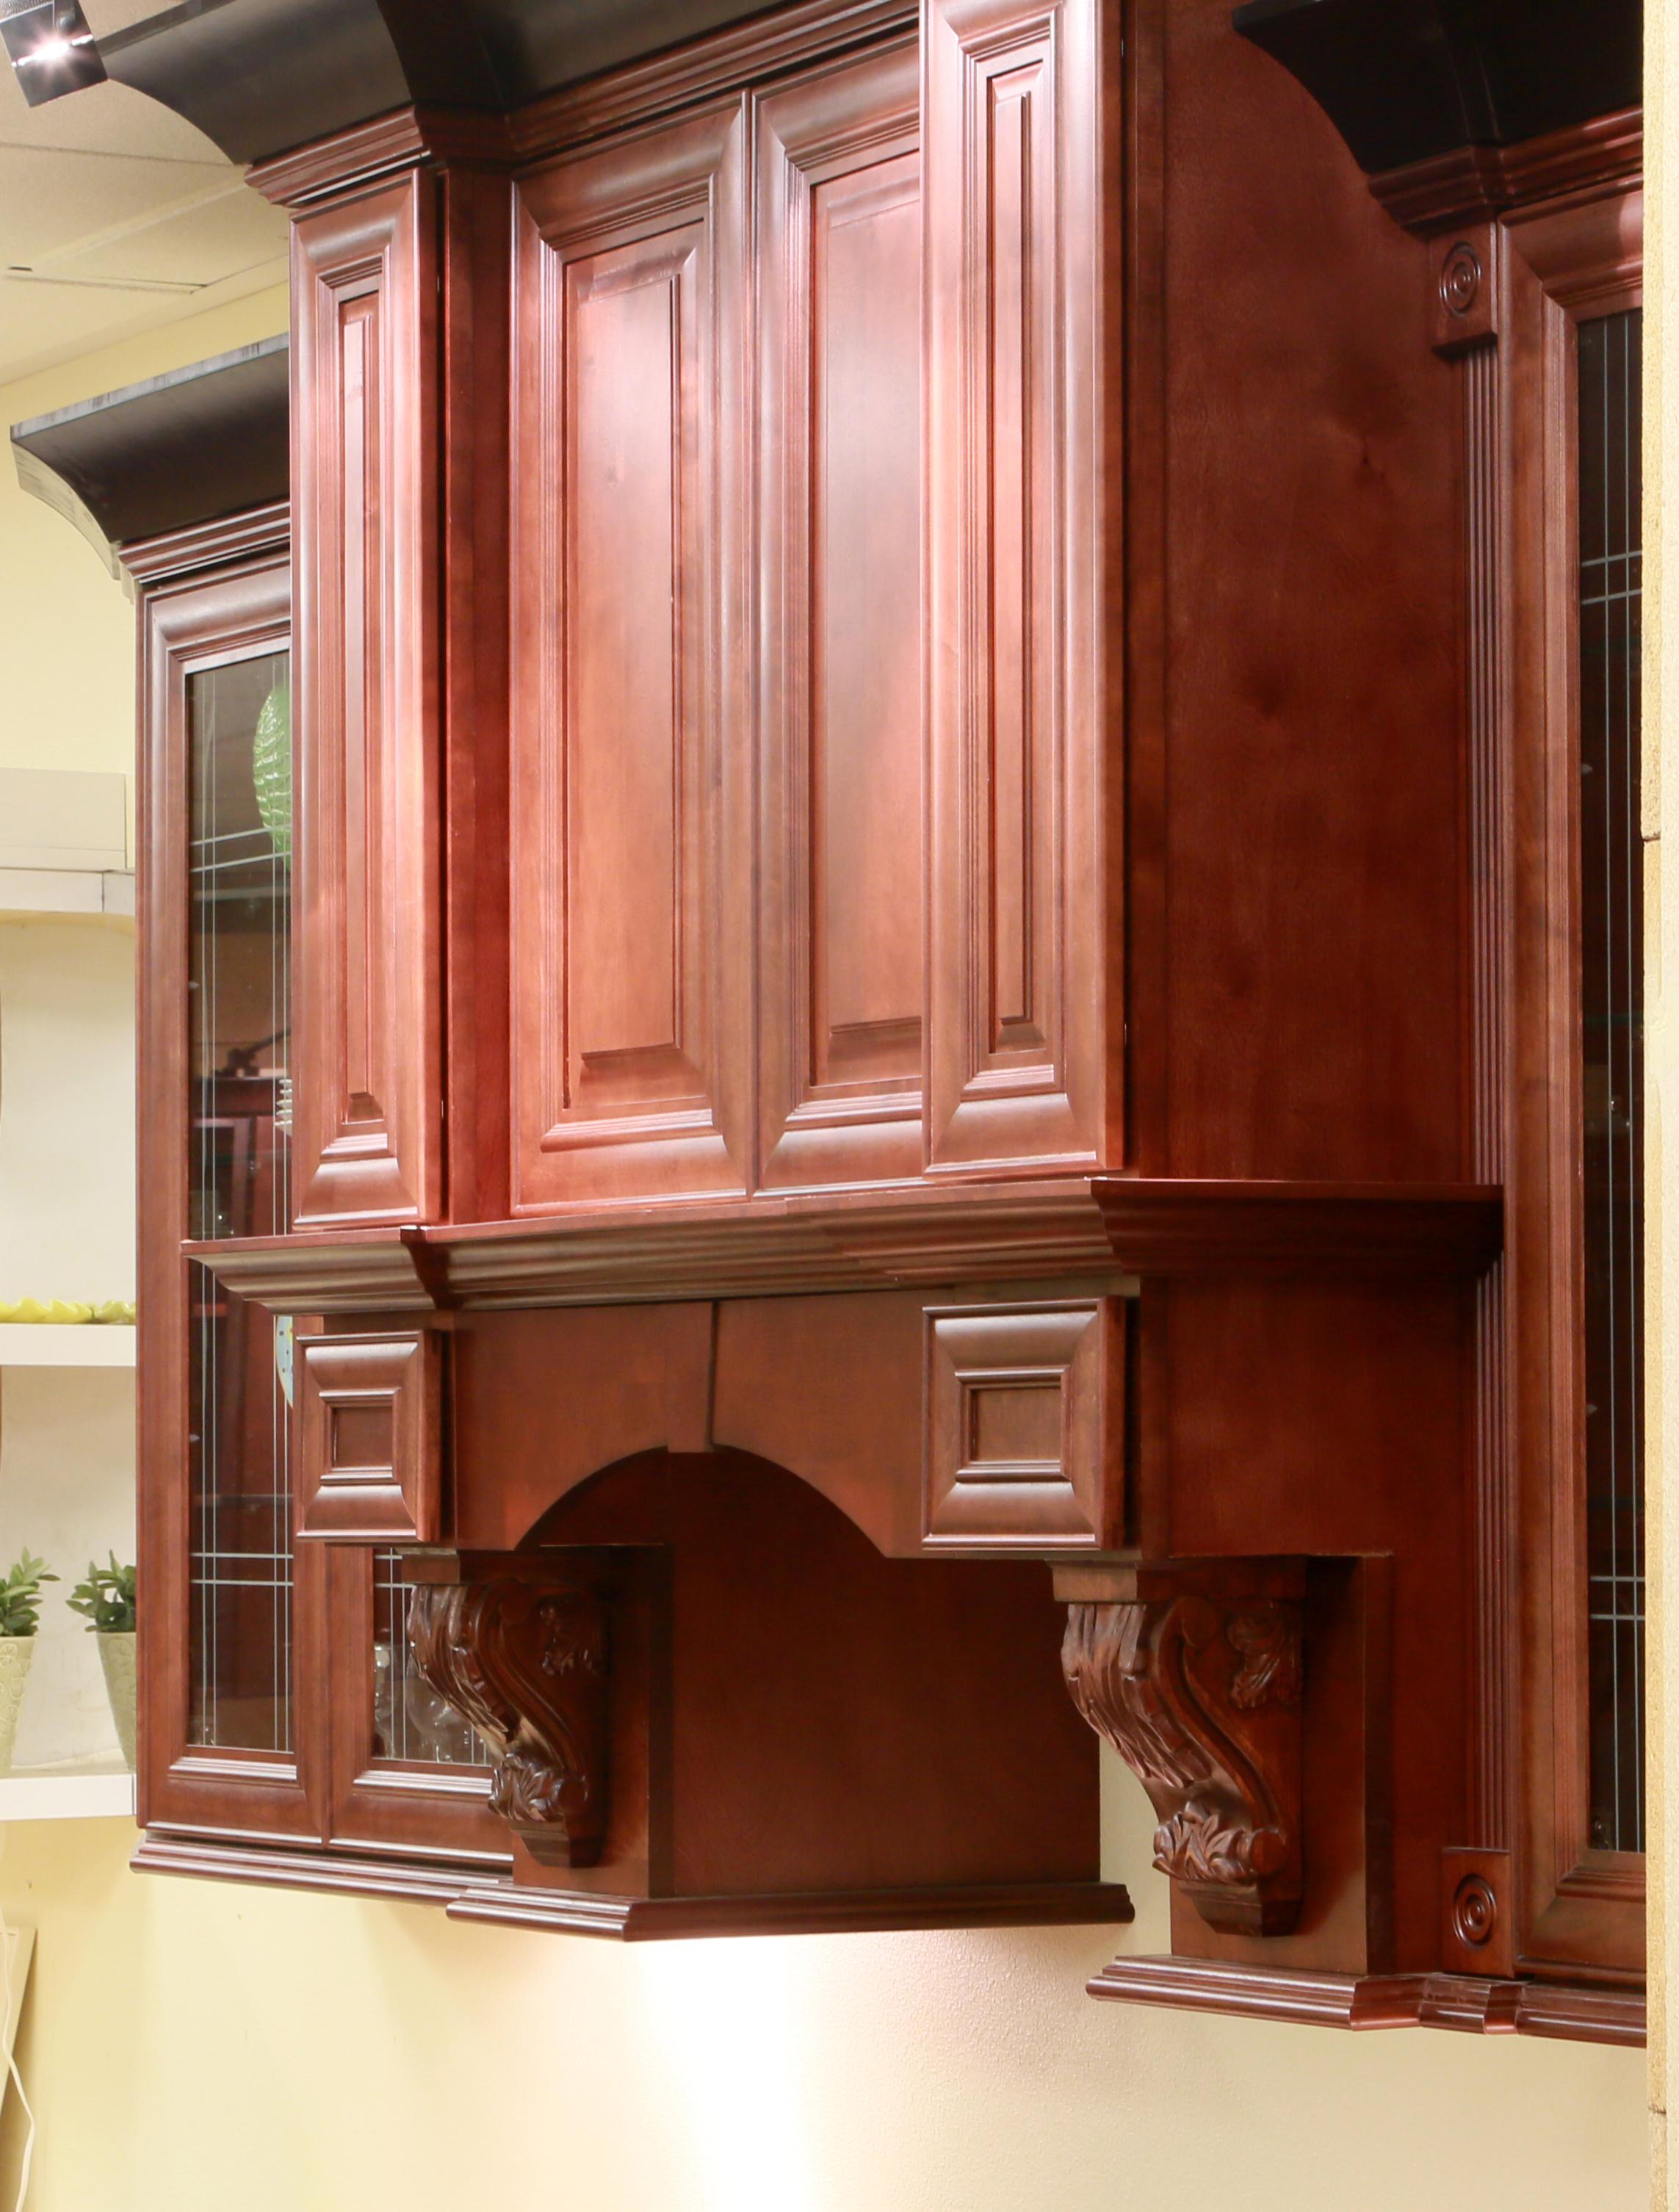 Cabinet Refacing Las Vegas Cabinet Refacing Las Vegas Nv Climer Kitchen Tune Up